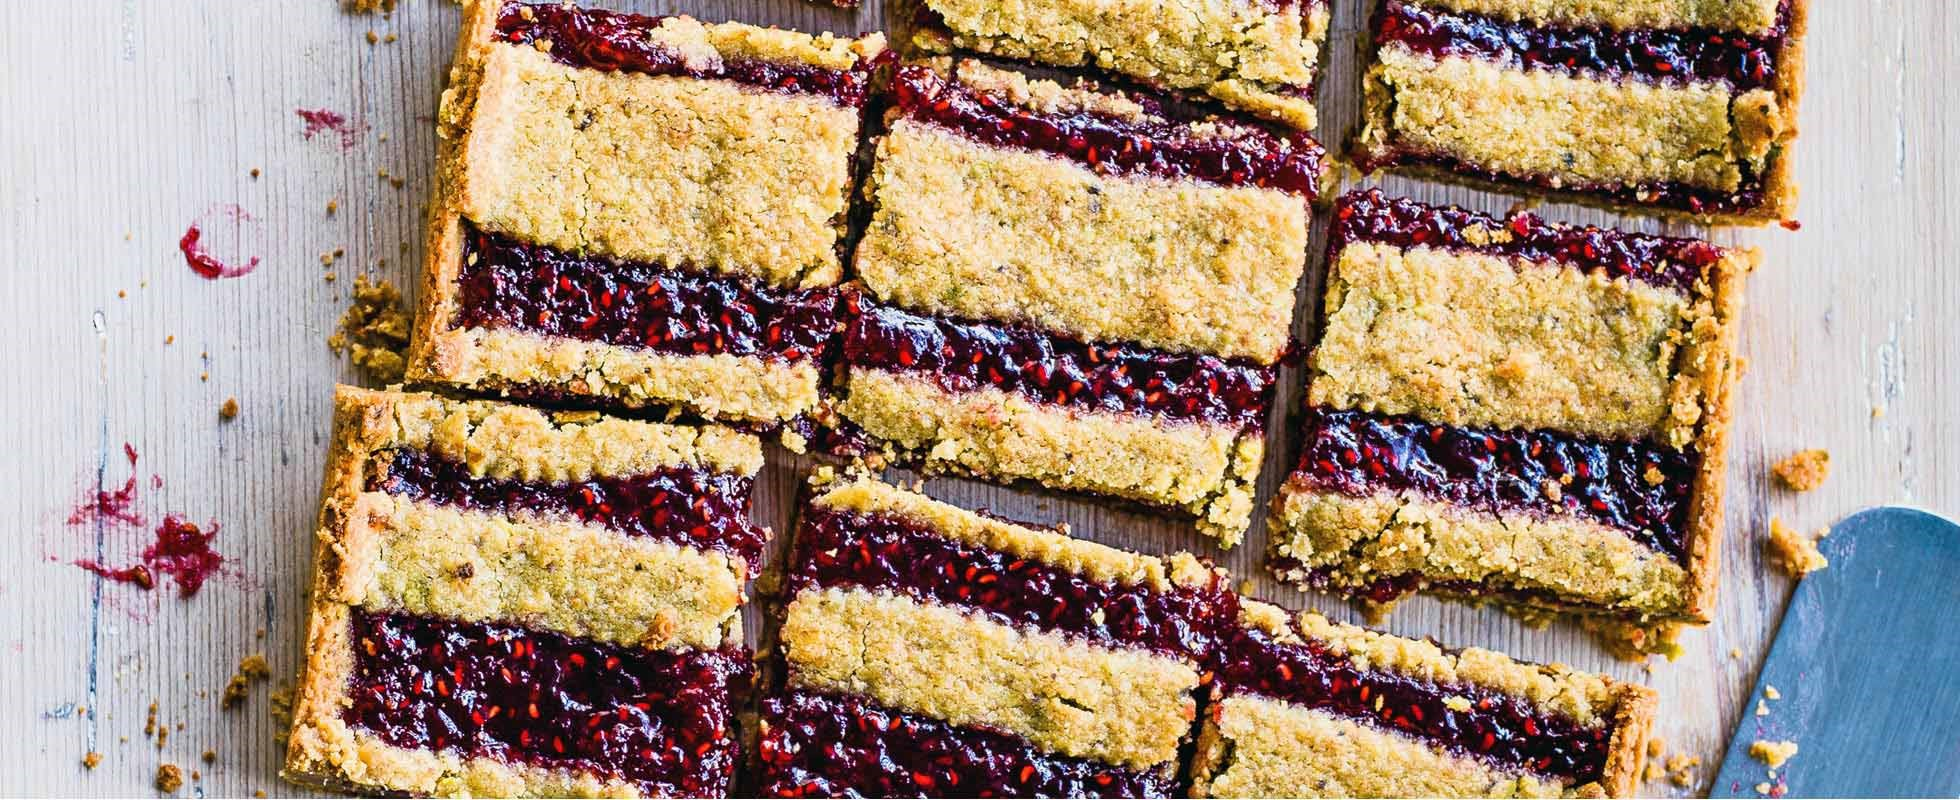 Raspberry and pistachio linzer tart